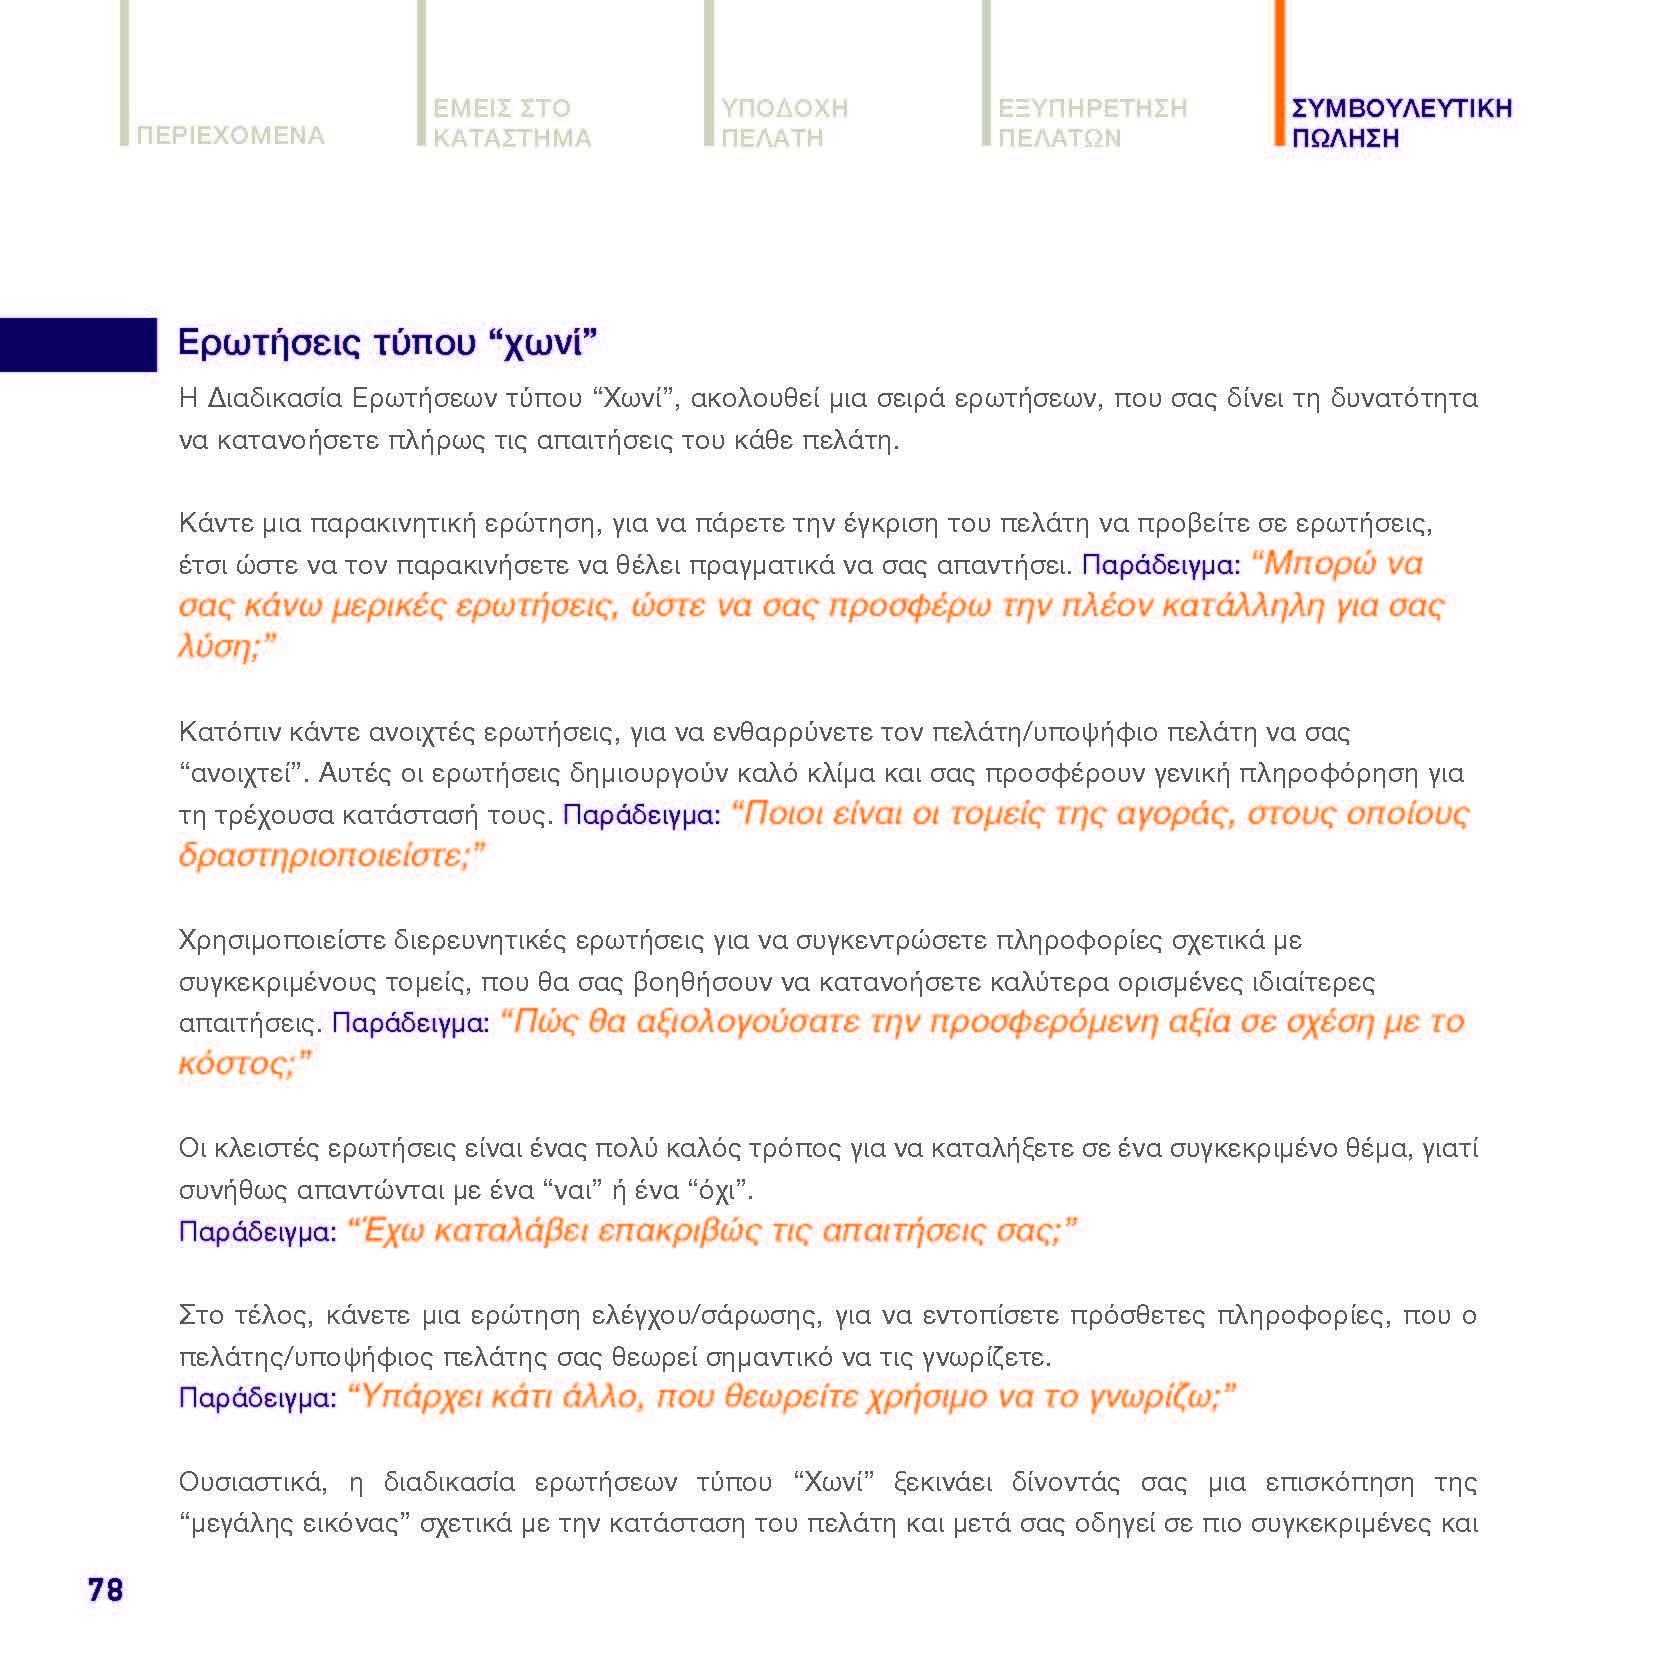 https://www.jib.gr/wp-content/uploads/2020/09/OPTIMA-BANK-BOOKLET-WEB_Page_078.jpg